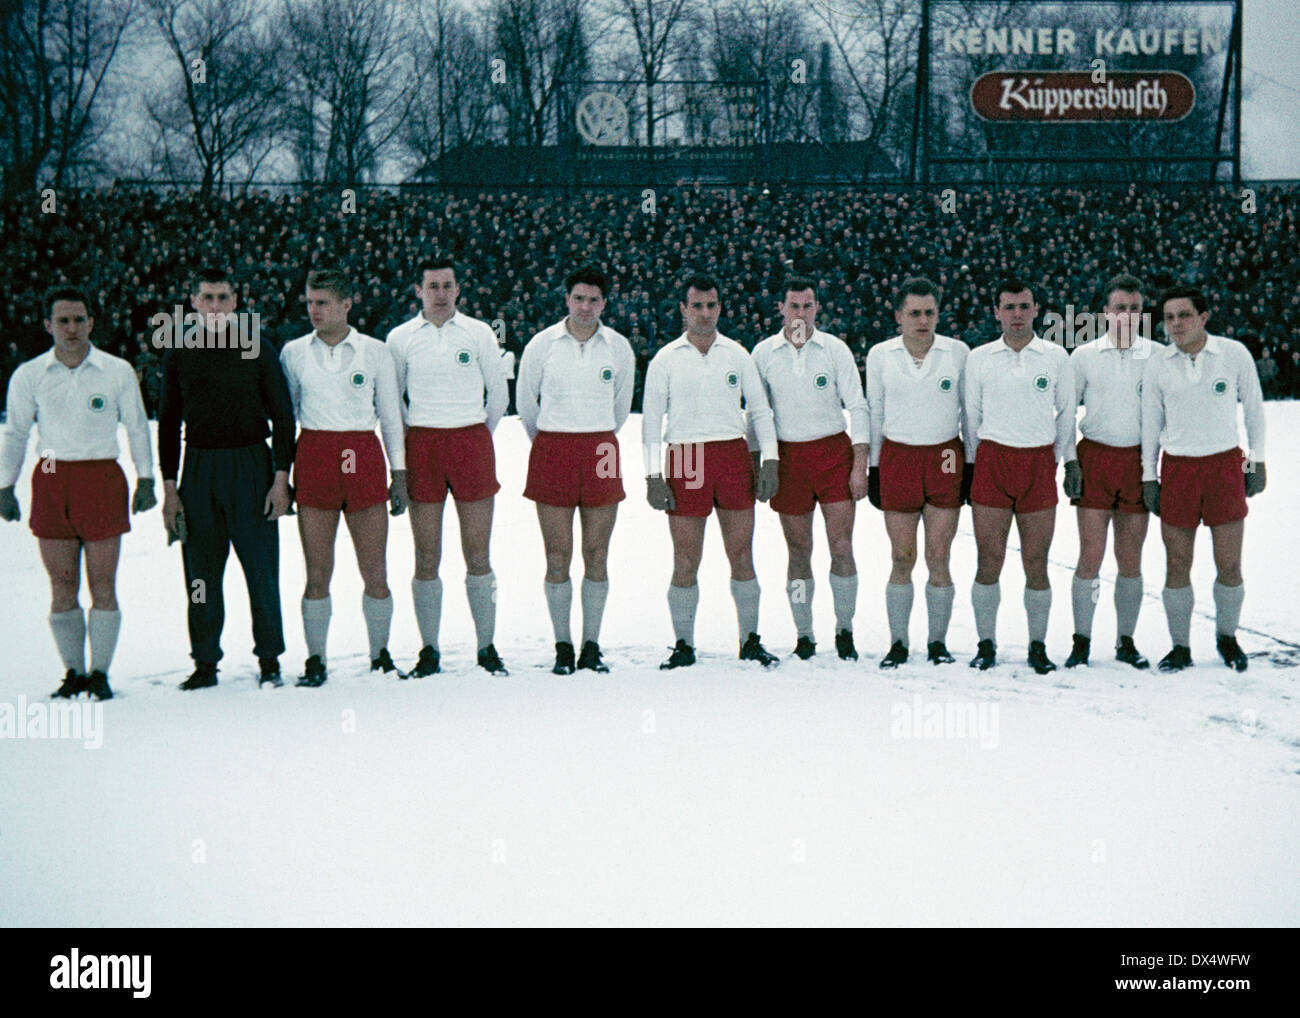 football, Oberliga West, 1962/1963, Glueckaufkampfbahn Gelsenkirchen, FC Schalke 04 versus Rot Weiss Oberhausen 1:1, team shot Oberhausen with Fredi Lauten (1.f.l.), Torwart Helmut Traska (2.f.l.), Helmut Laszig (3.f.l.), Jule Hans Barwenzik (6.f.l.), Fri - Stock Image